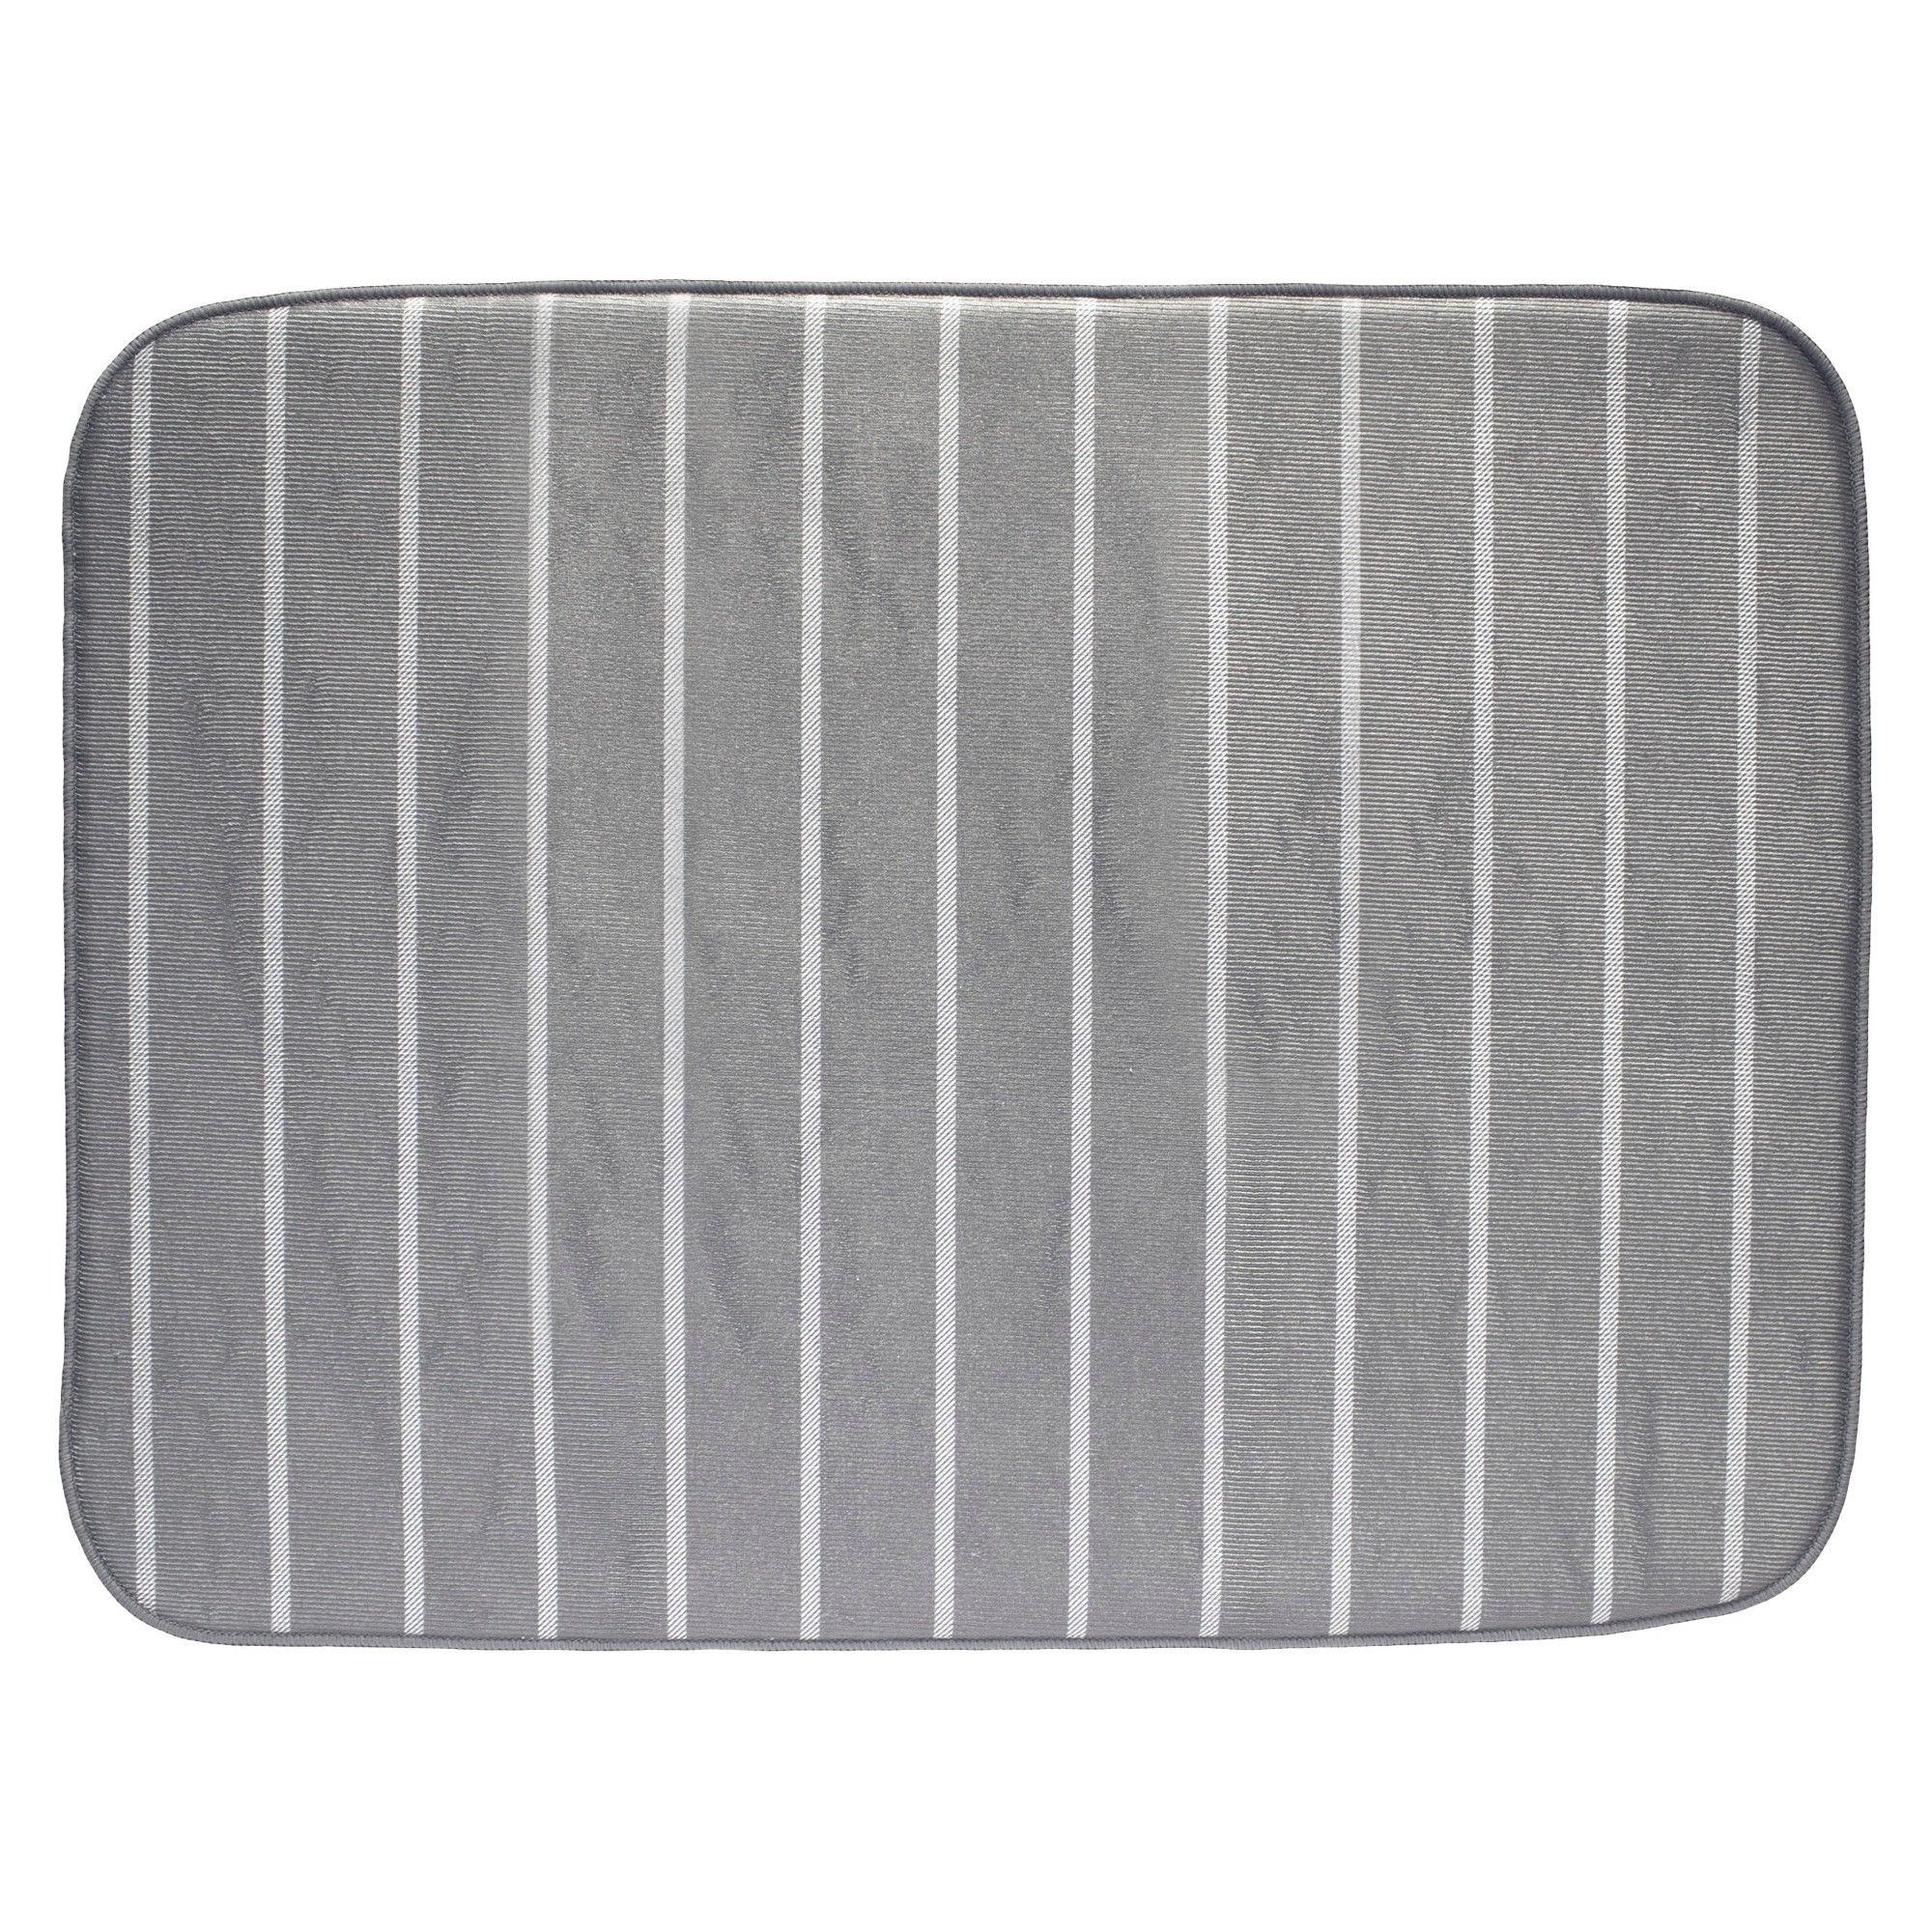 Target Dish Drying Rack Dish Drying Mat  Gray  Threshold  Products